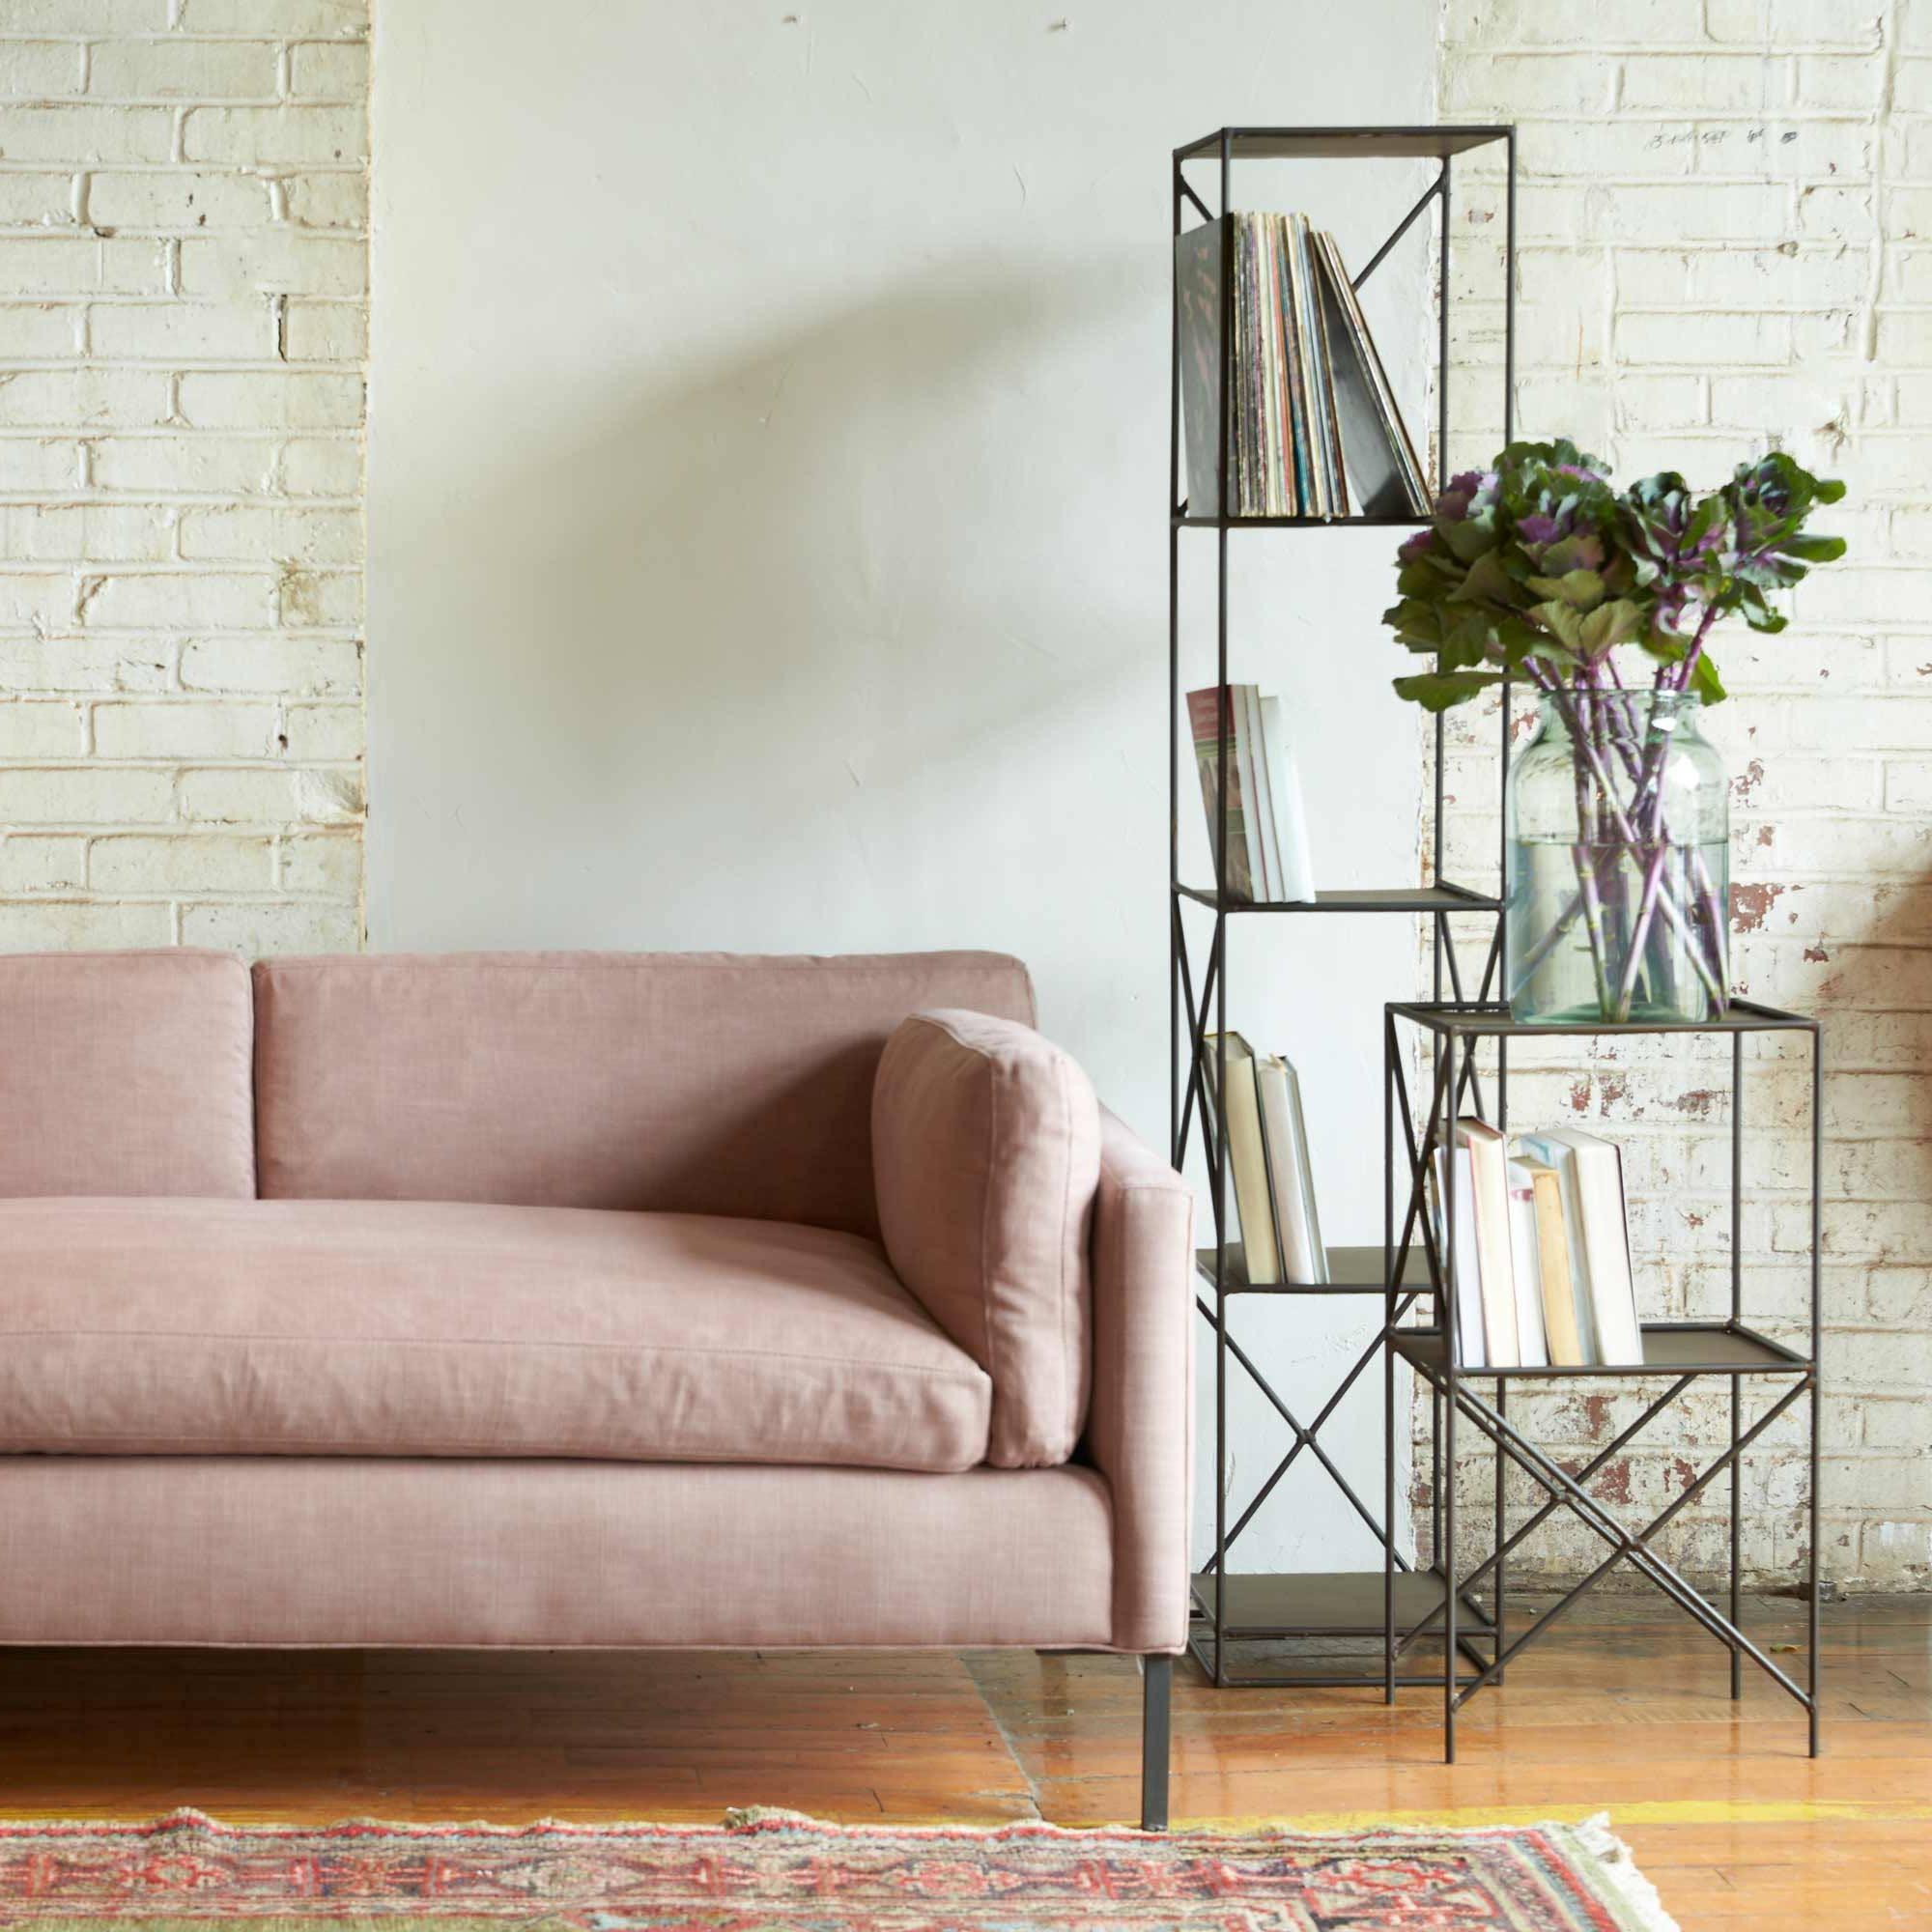 Pleasant Cisco Brothers Urban Natural Home Furnishings Machost Co Dining Chair Design Ideas Machostcouk